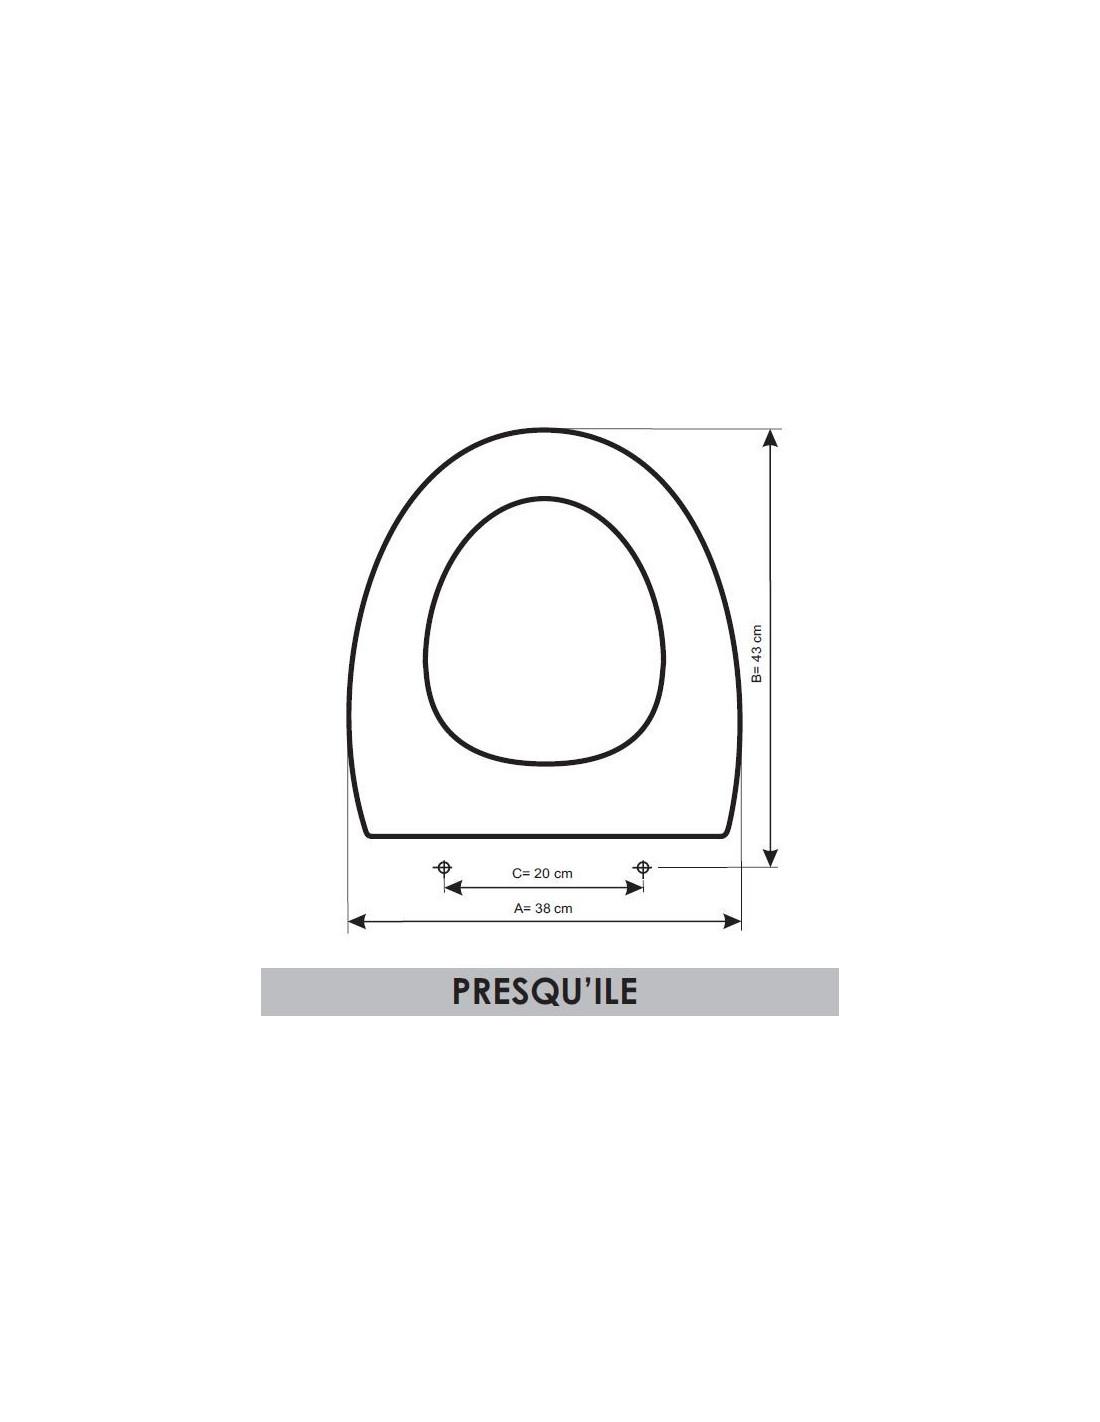 seat wc jacob delafon presquile adaptable in resiwood. Black Bedroom Furniture Sets. Home Design Ideas